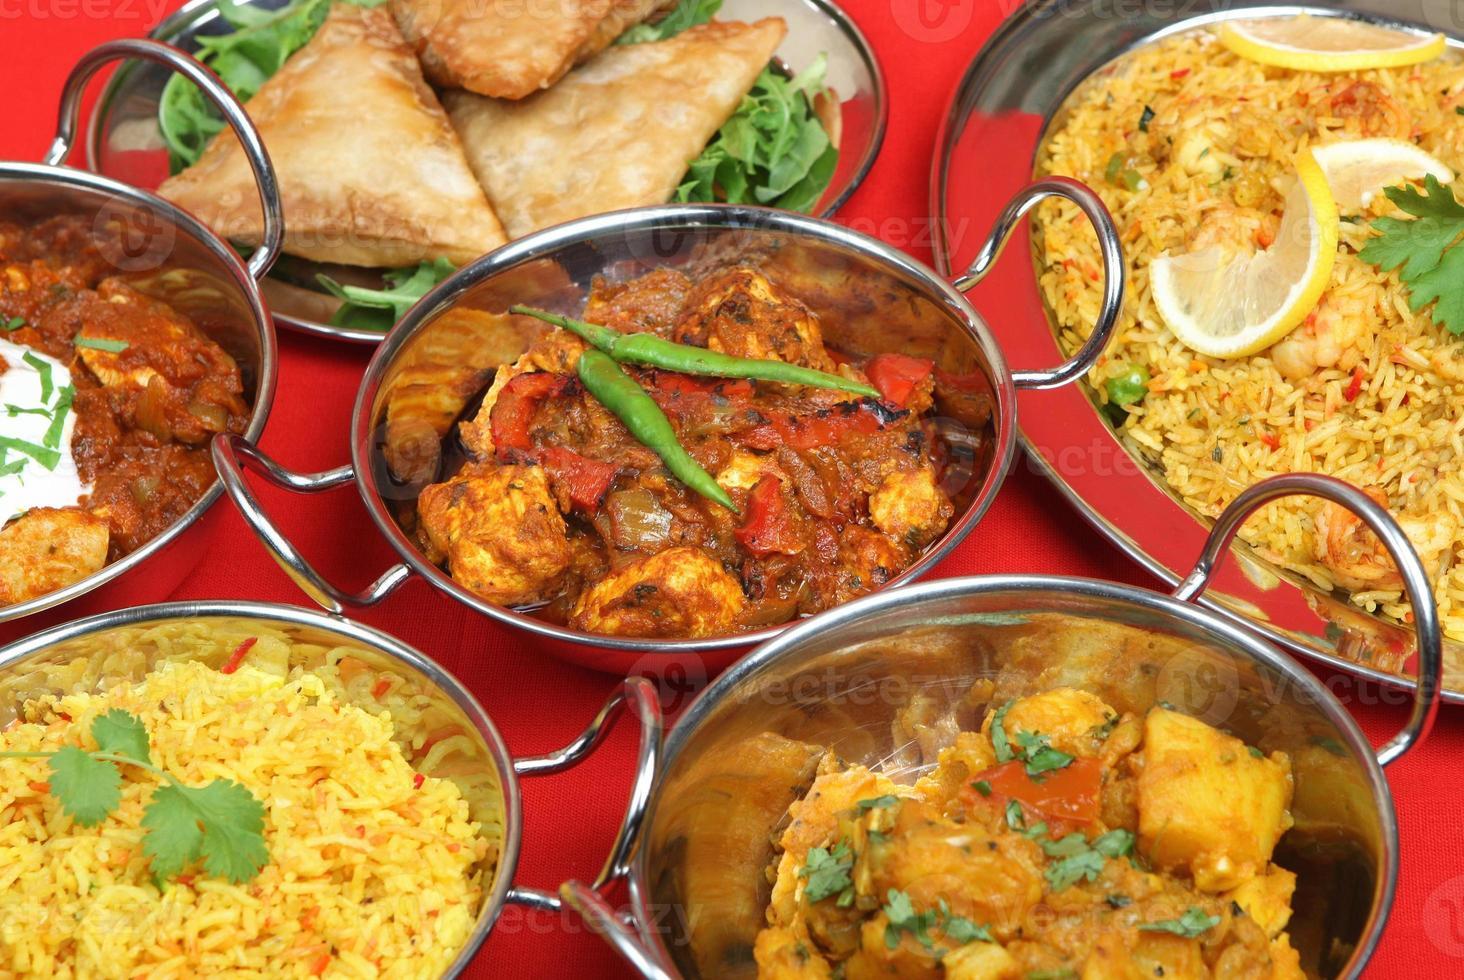 repas de curry indien photo